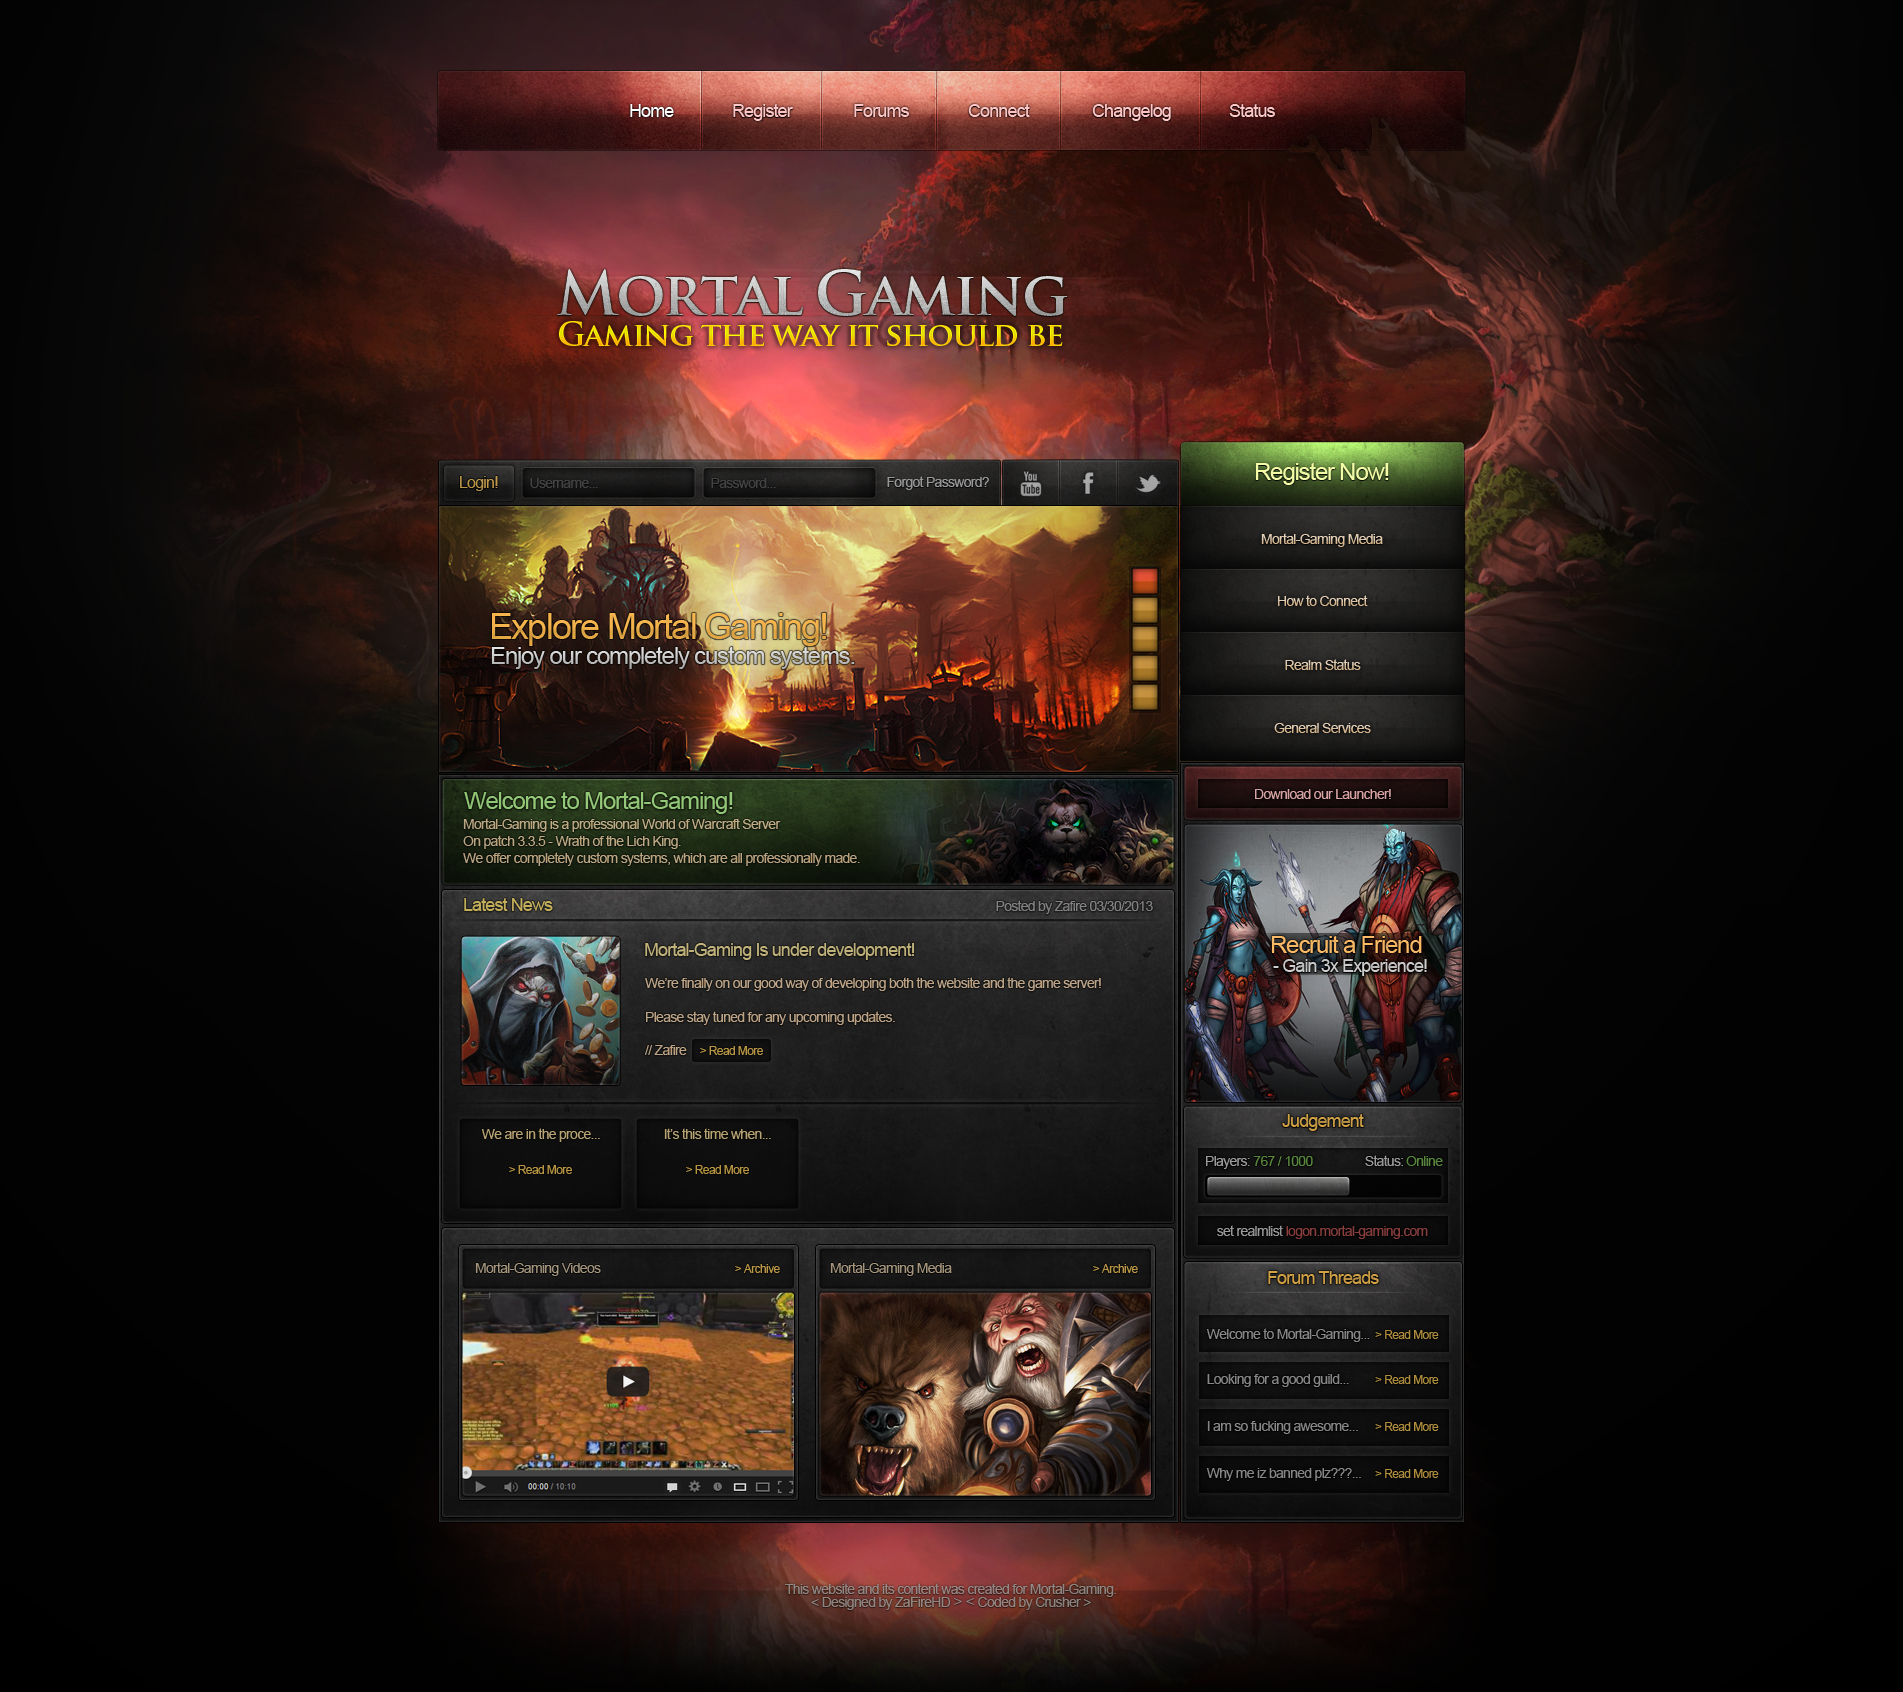 Mortal Gaming Website Design by ZafireHD on DeviantArt